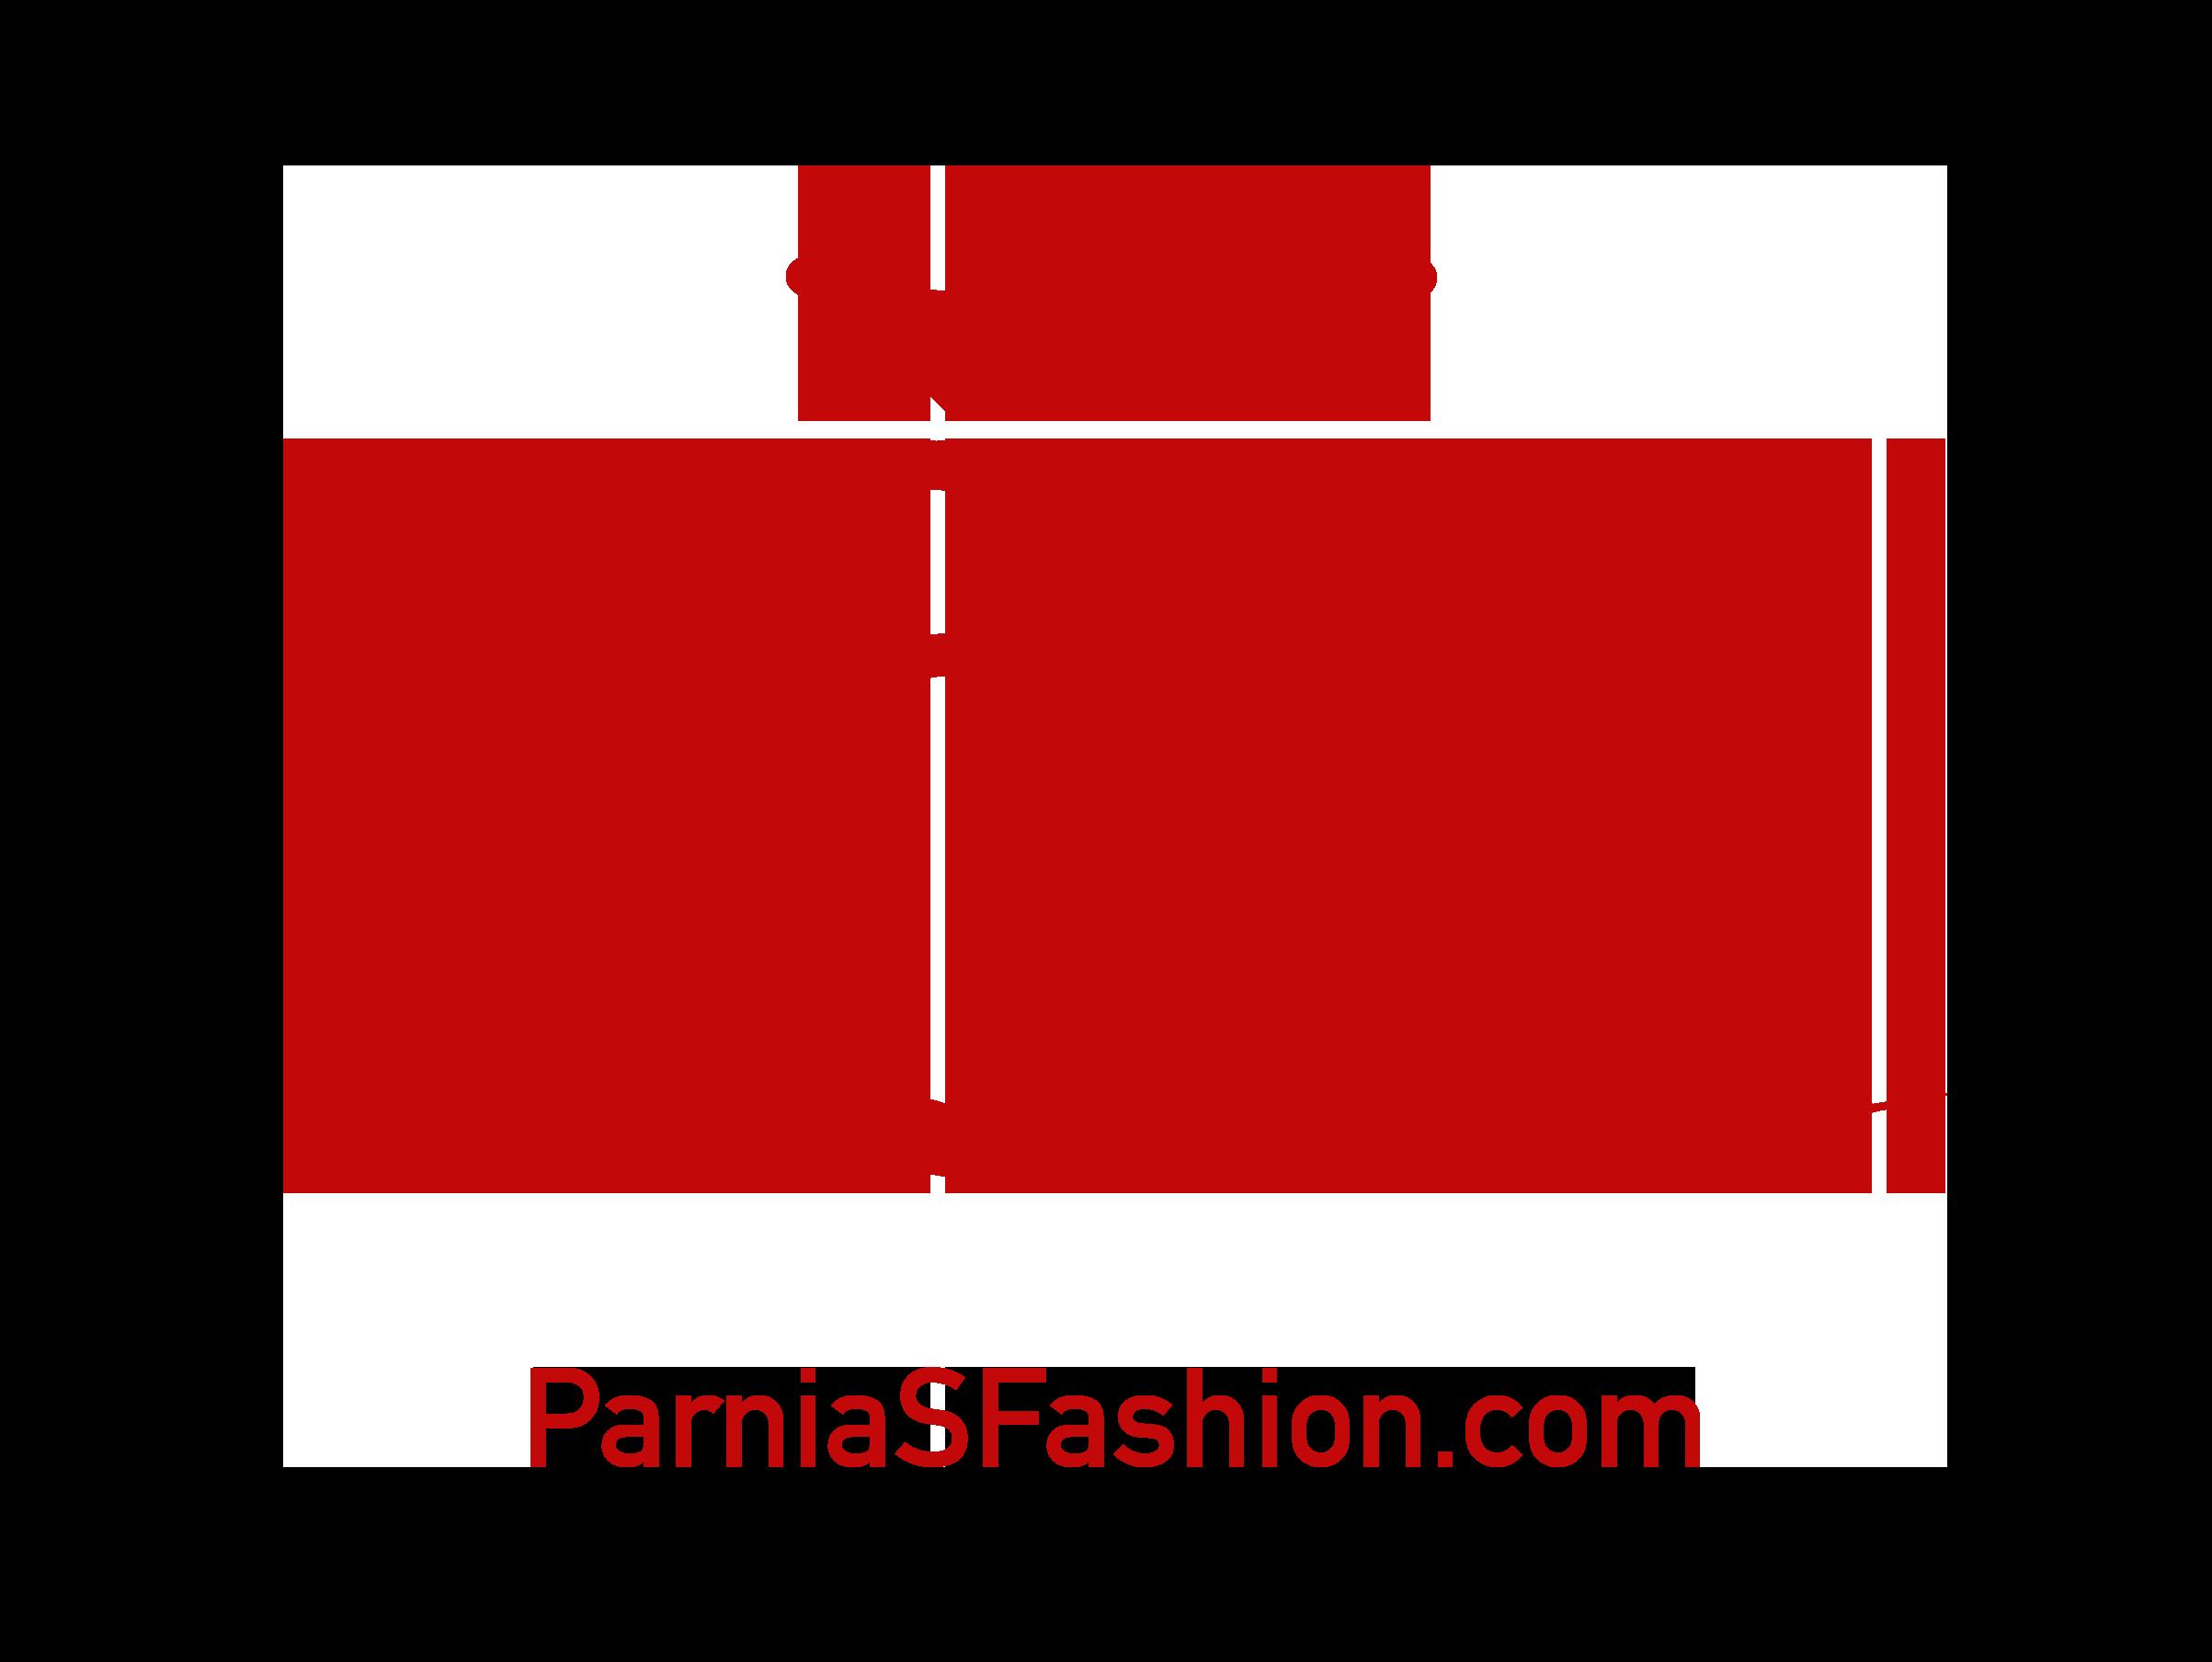 ParniaSFashion